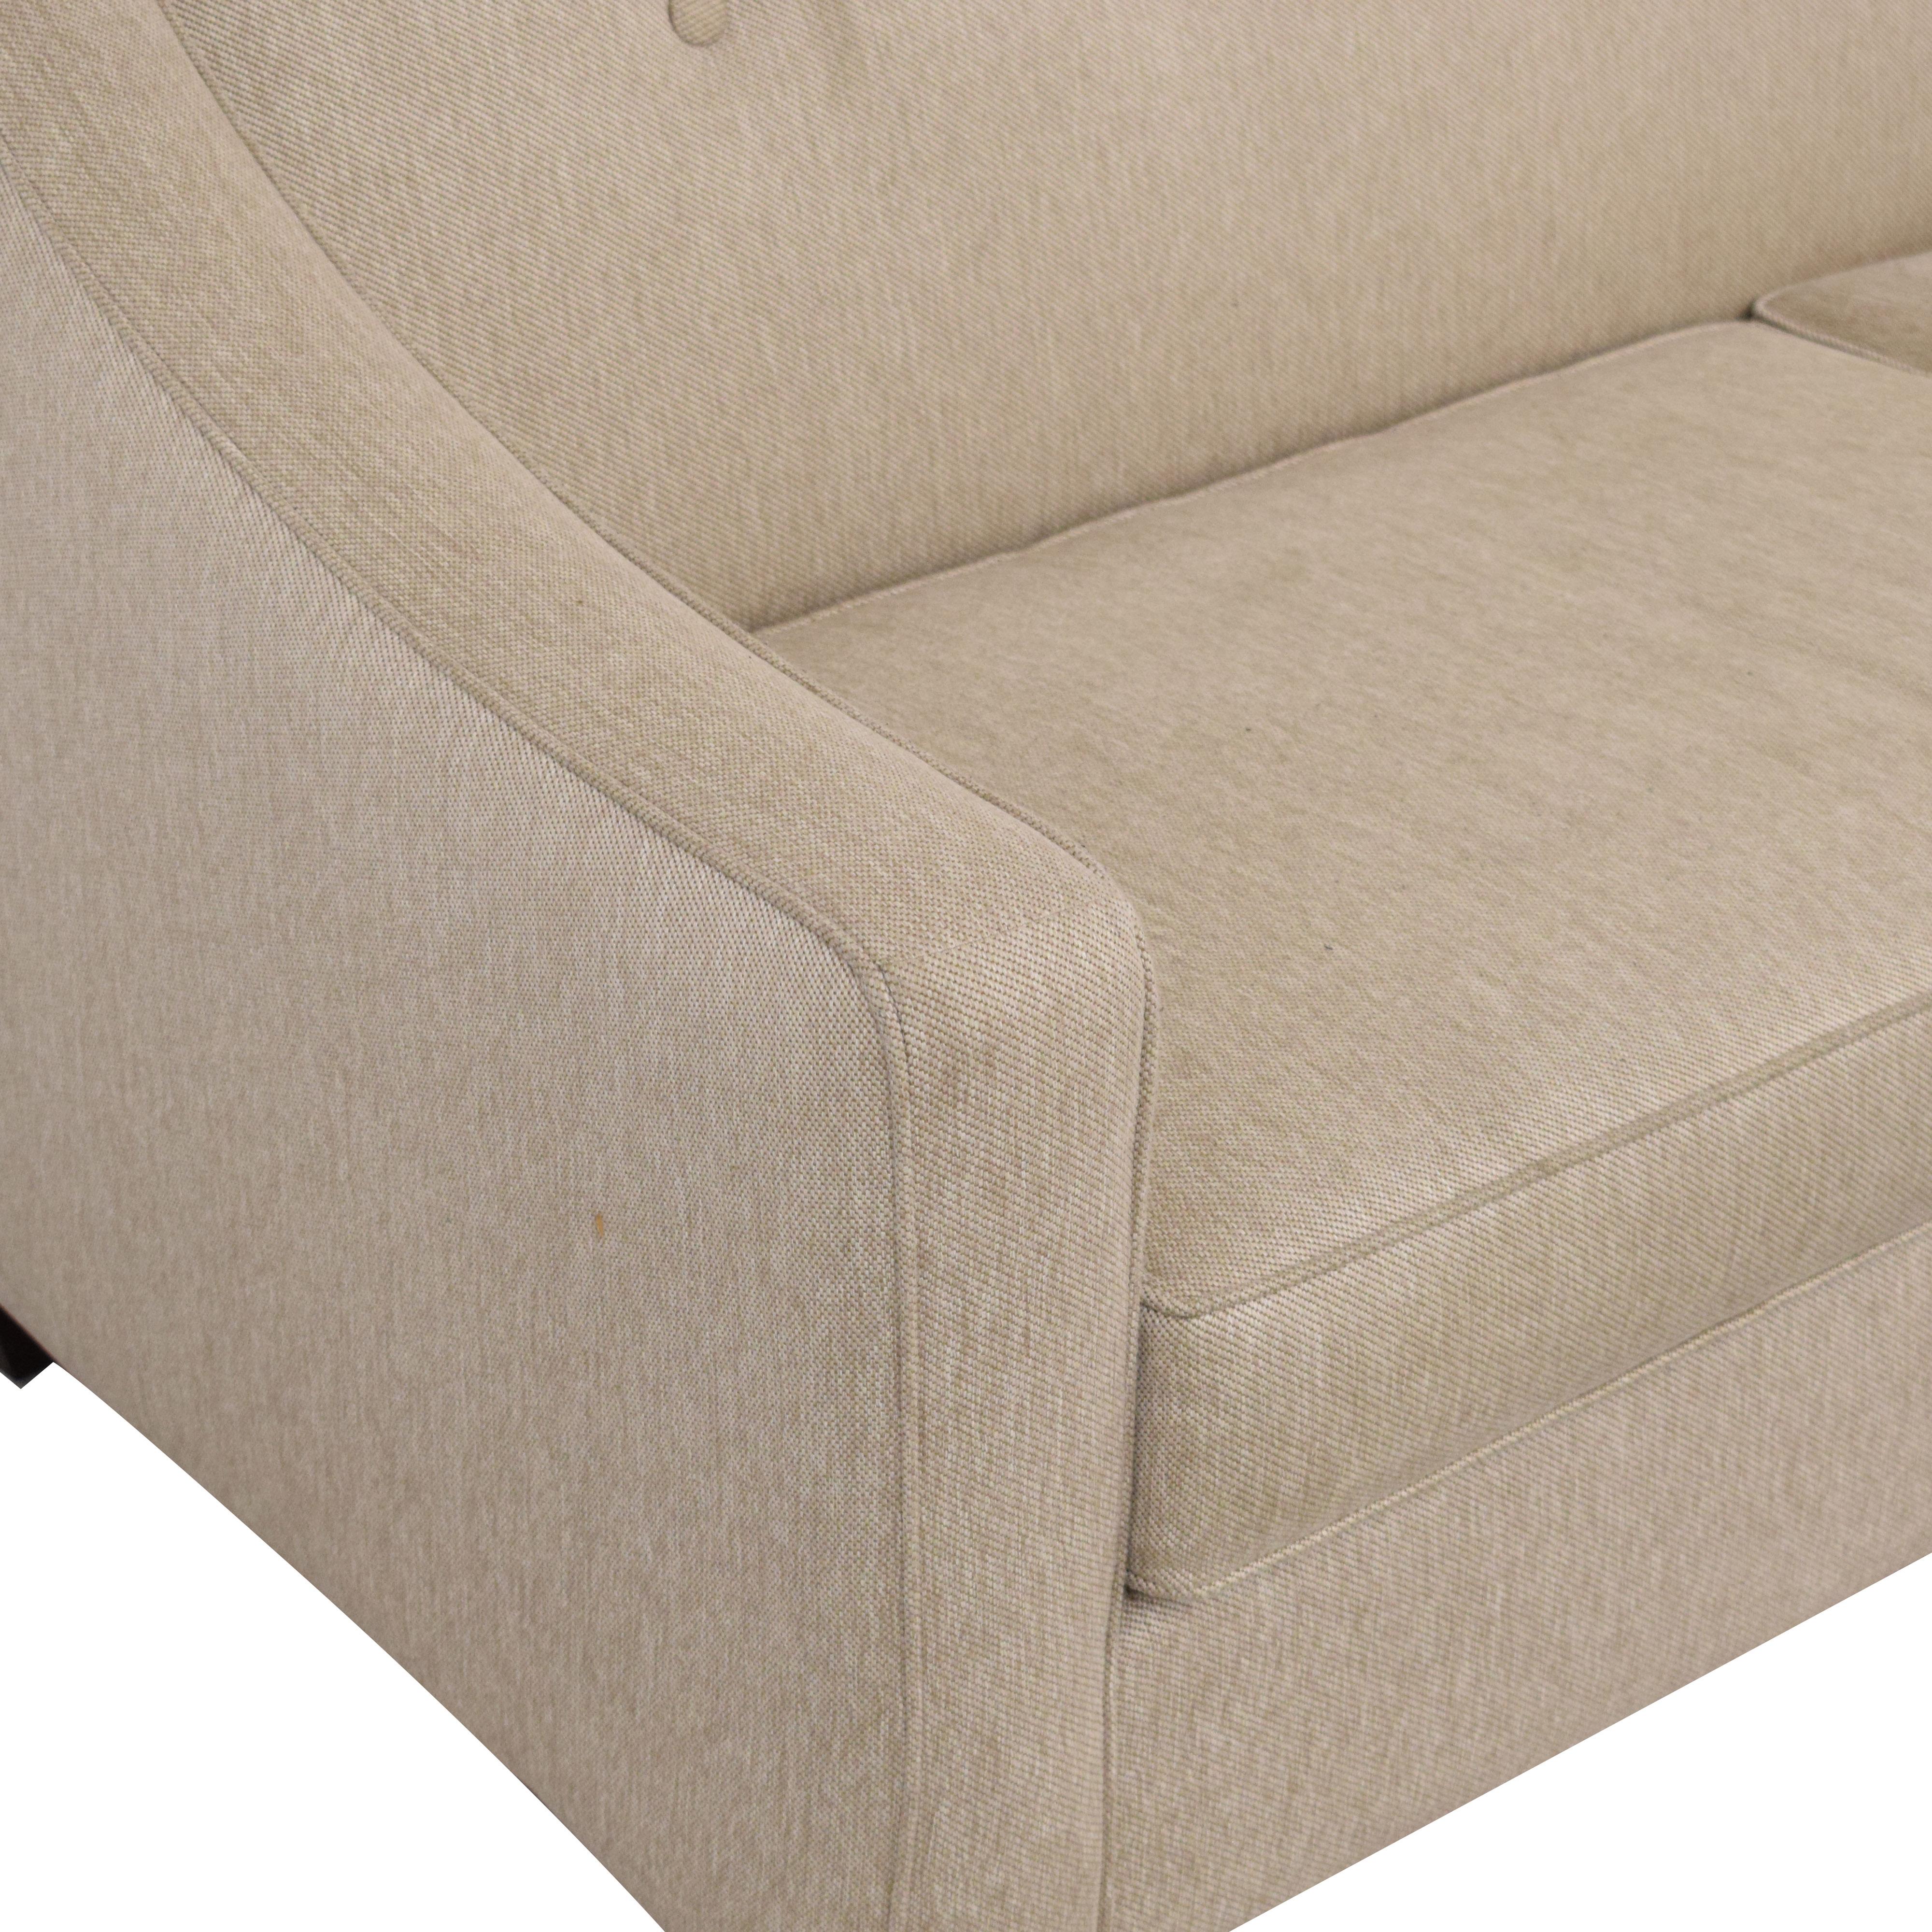 shop Craftmaster Furniture Craftmaster Two Cushion Sofa online